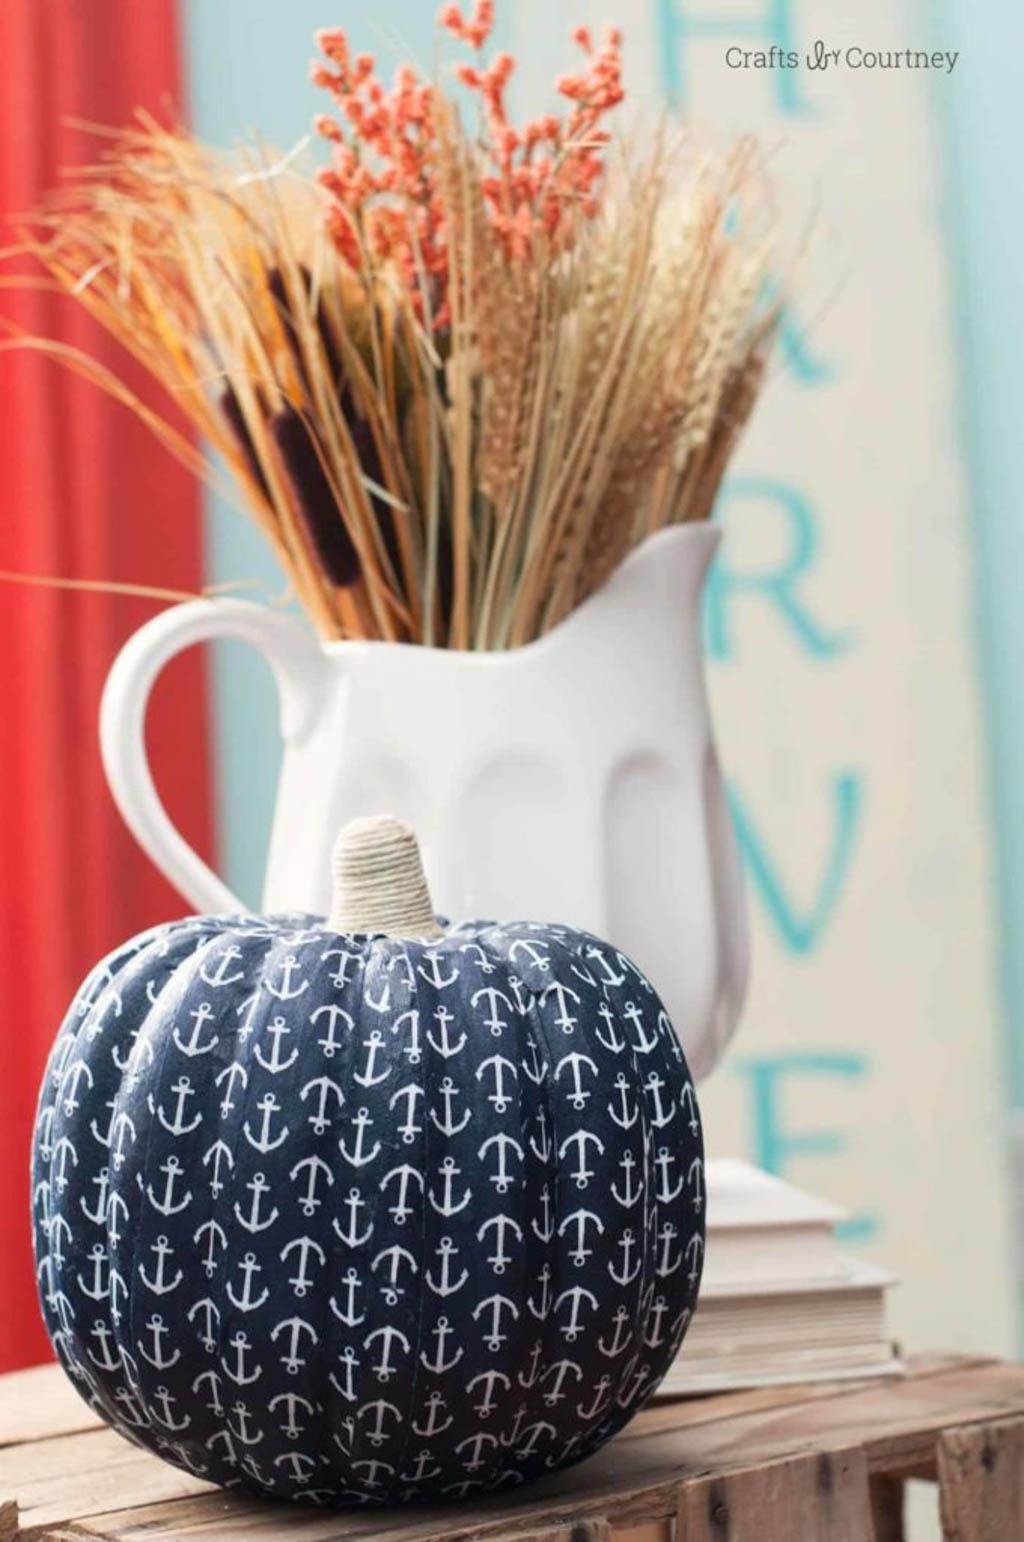 coastal fall decor idea using pumpkin covered in boat anchor motif fabric